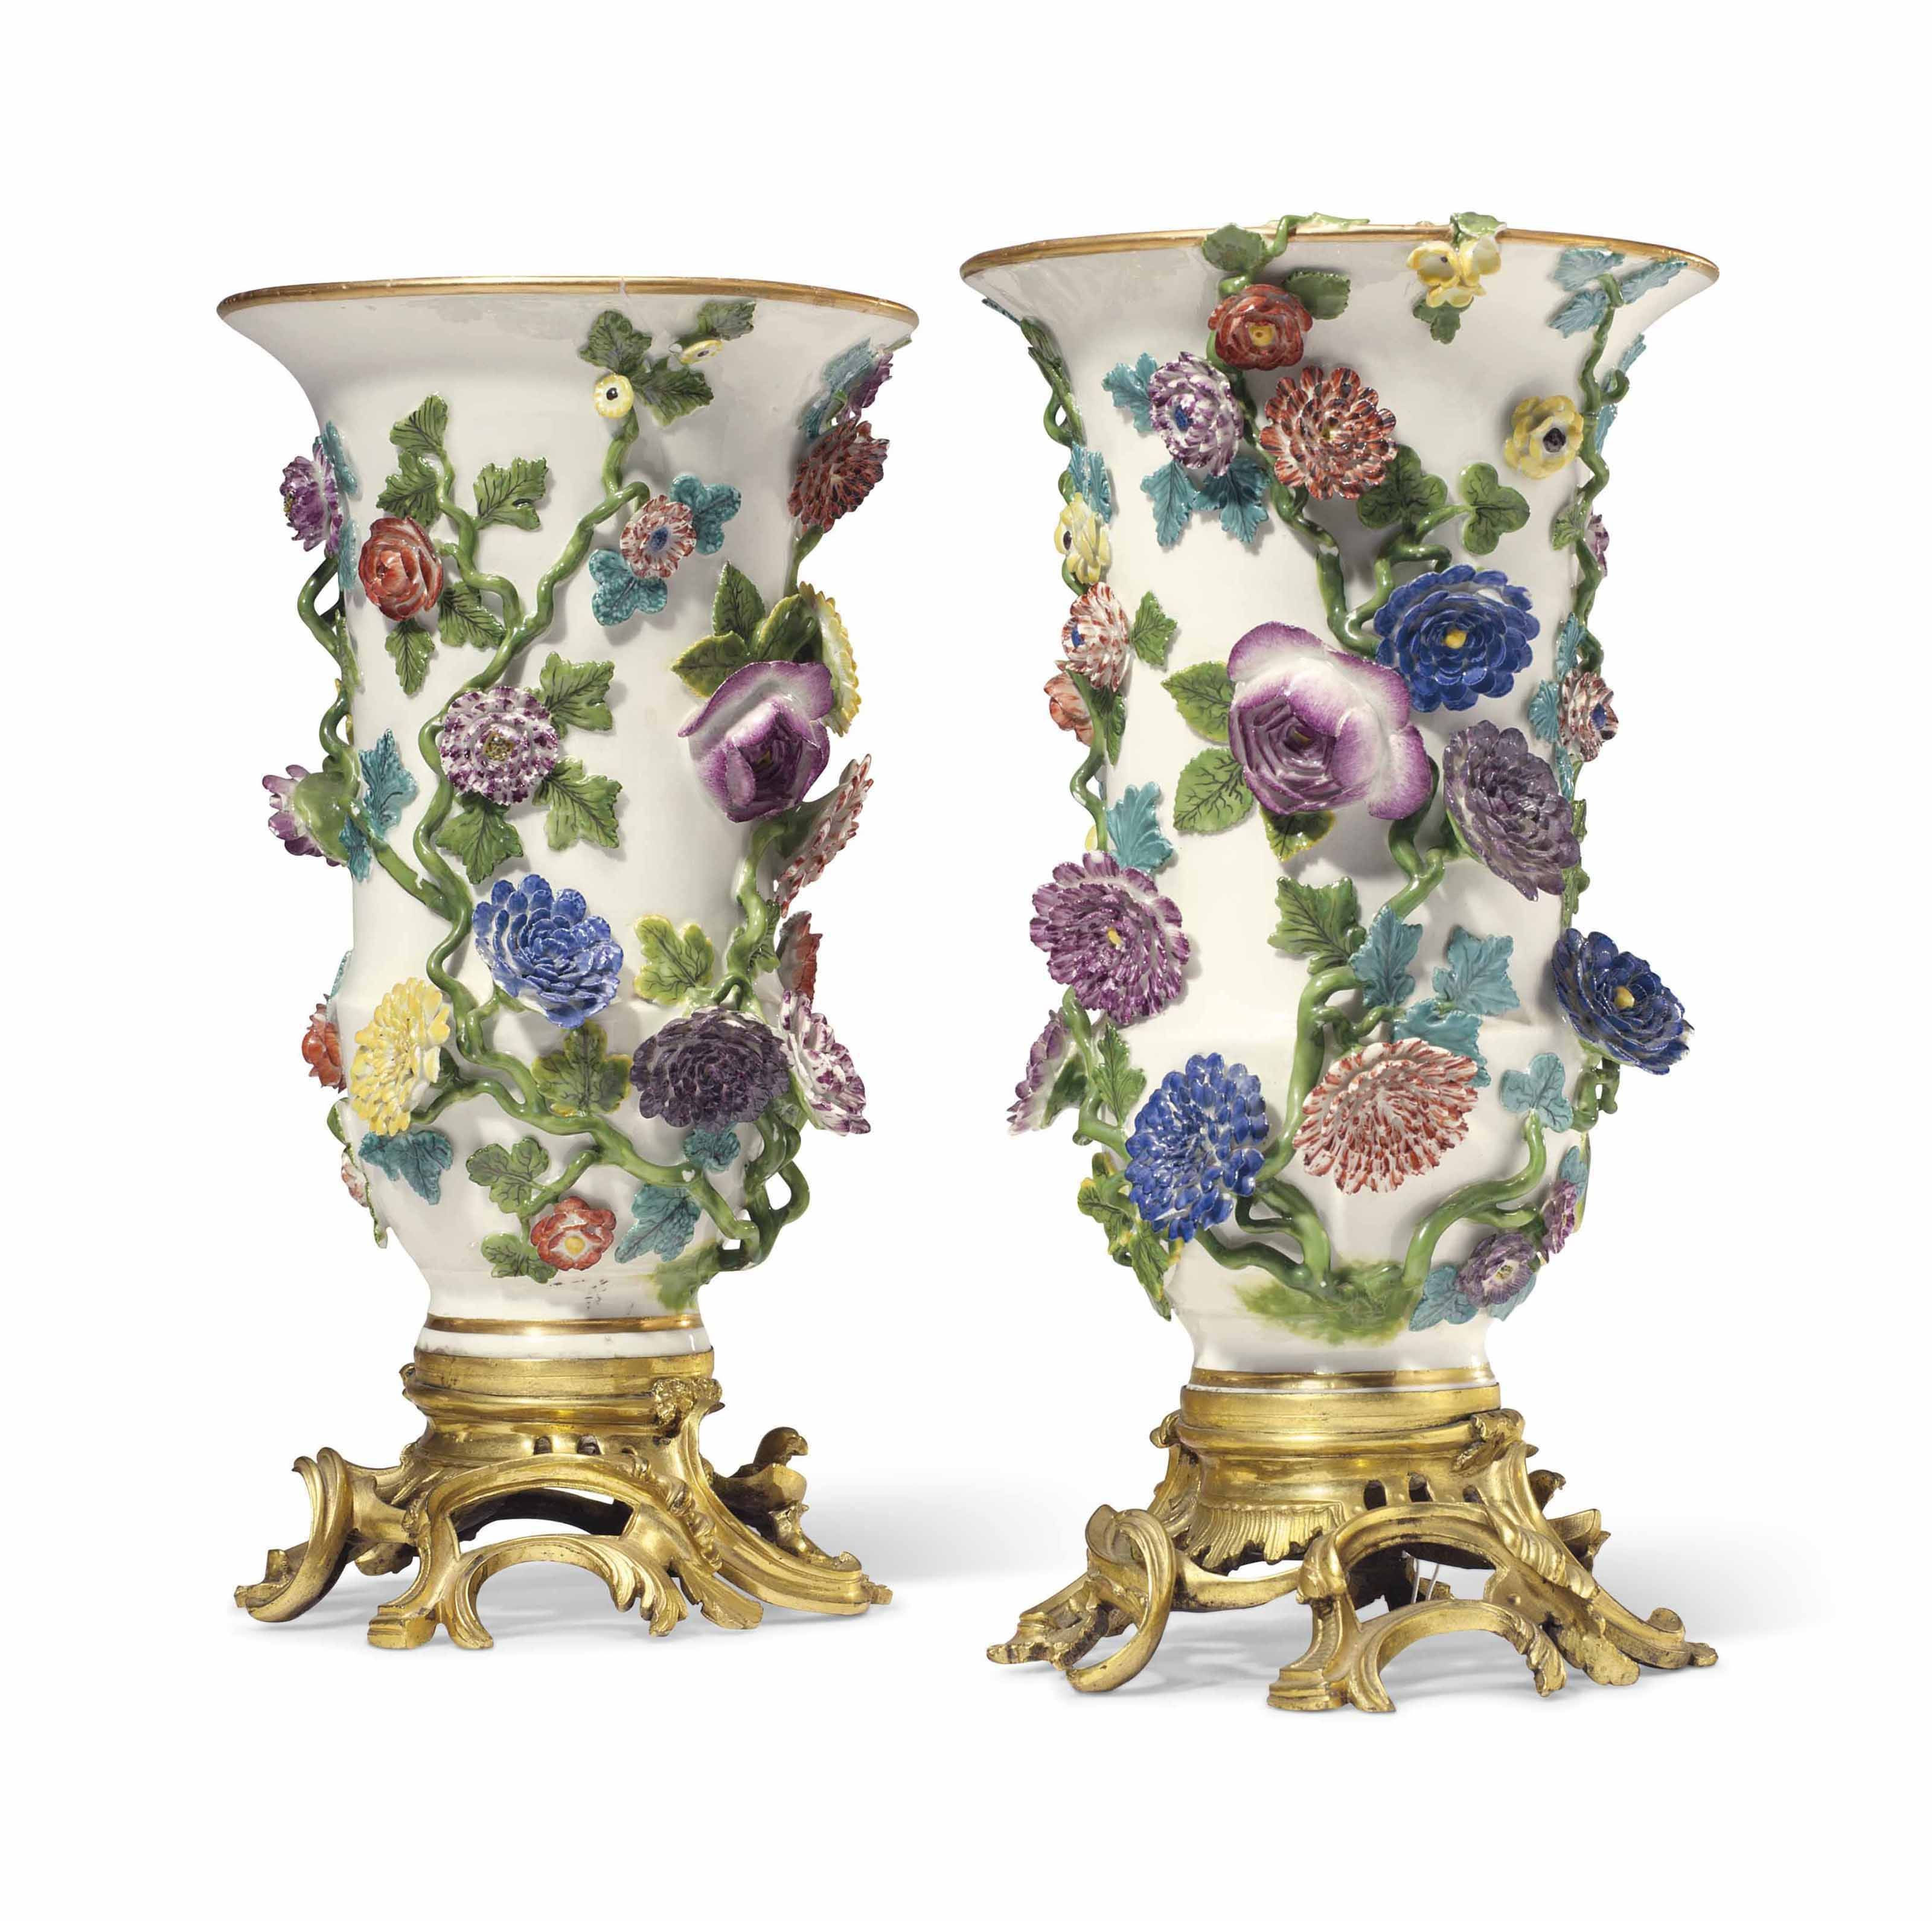 22 Cute Glass Beads For Flower Vases Decorative Vase Ideas